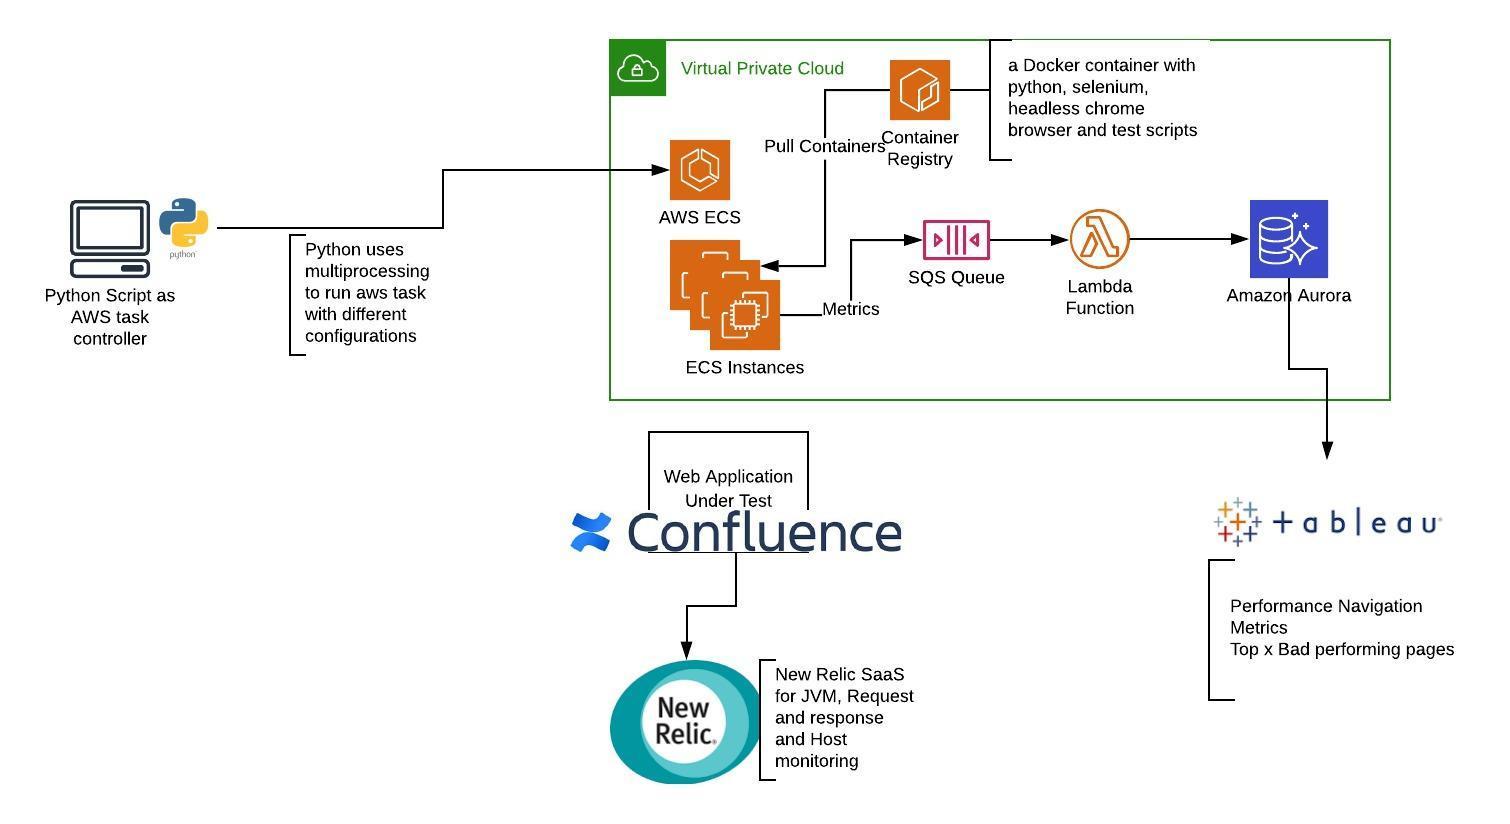 Using Selenium, Docker, and Cloud for Performance Testing